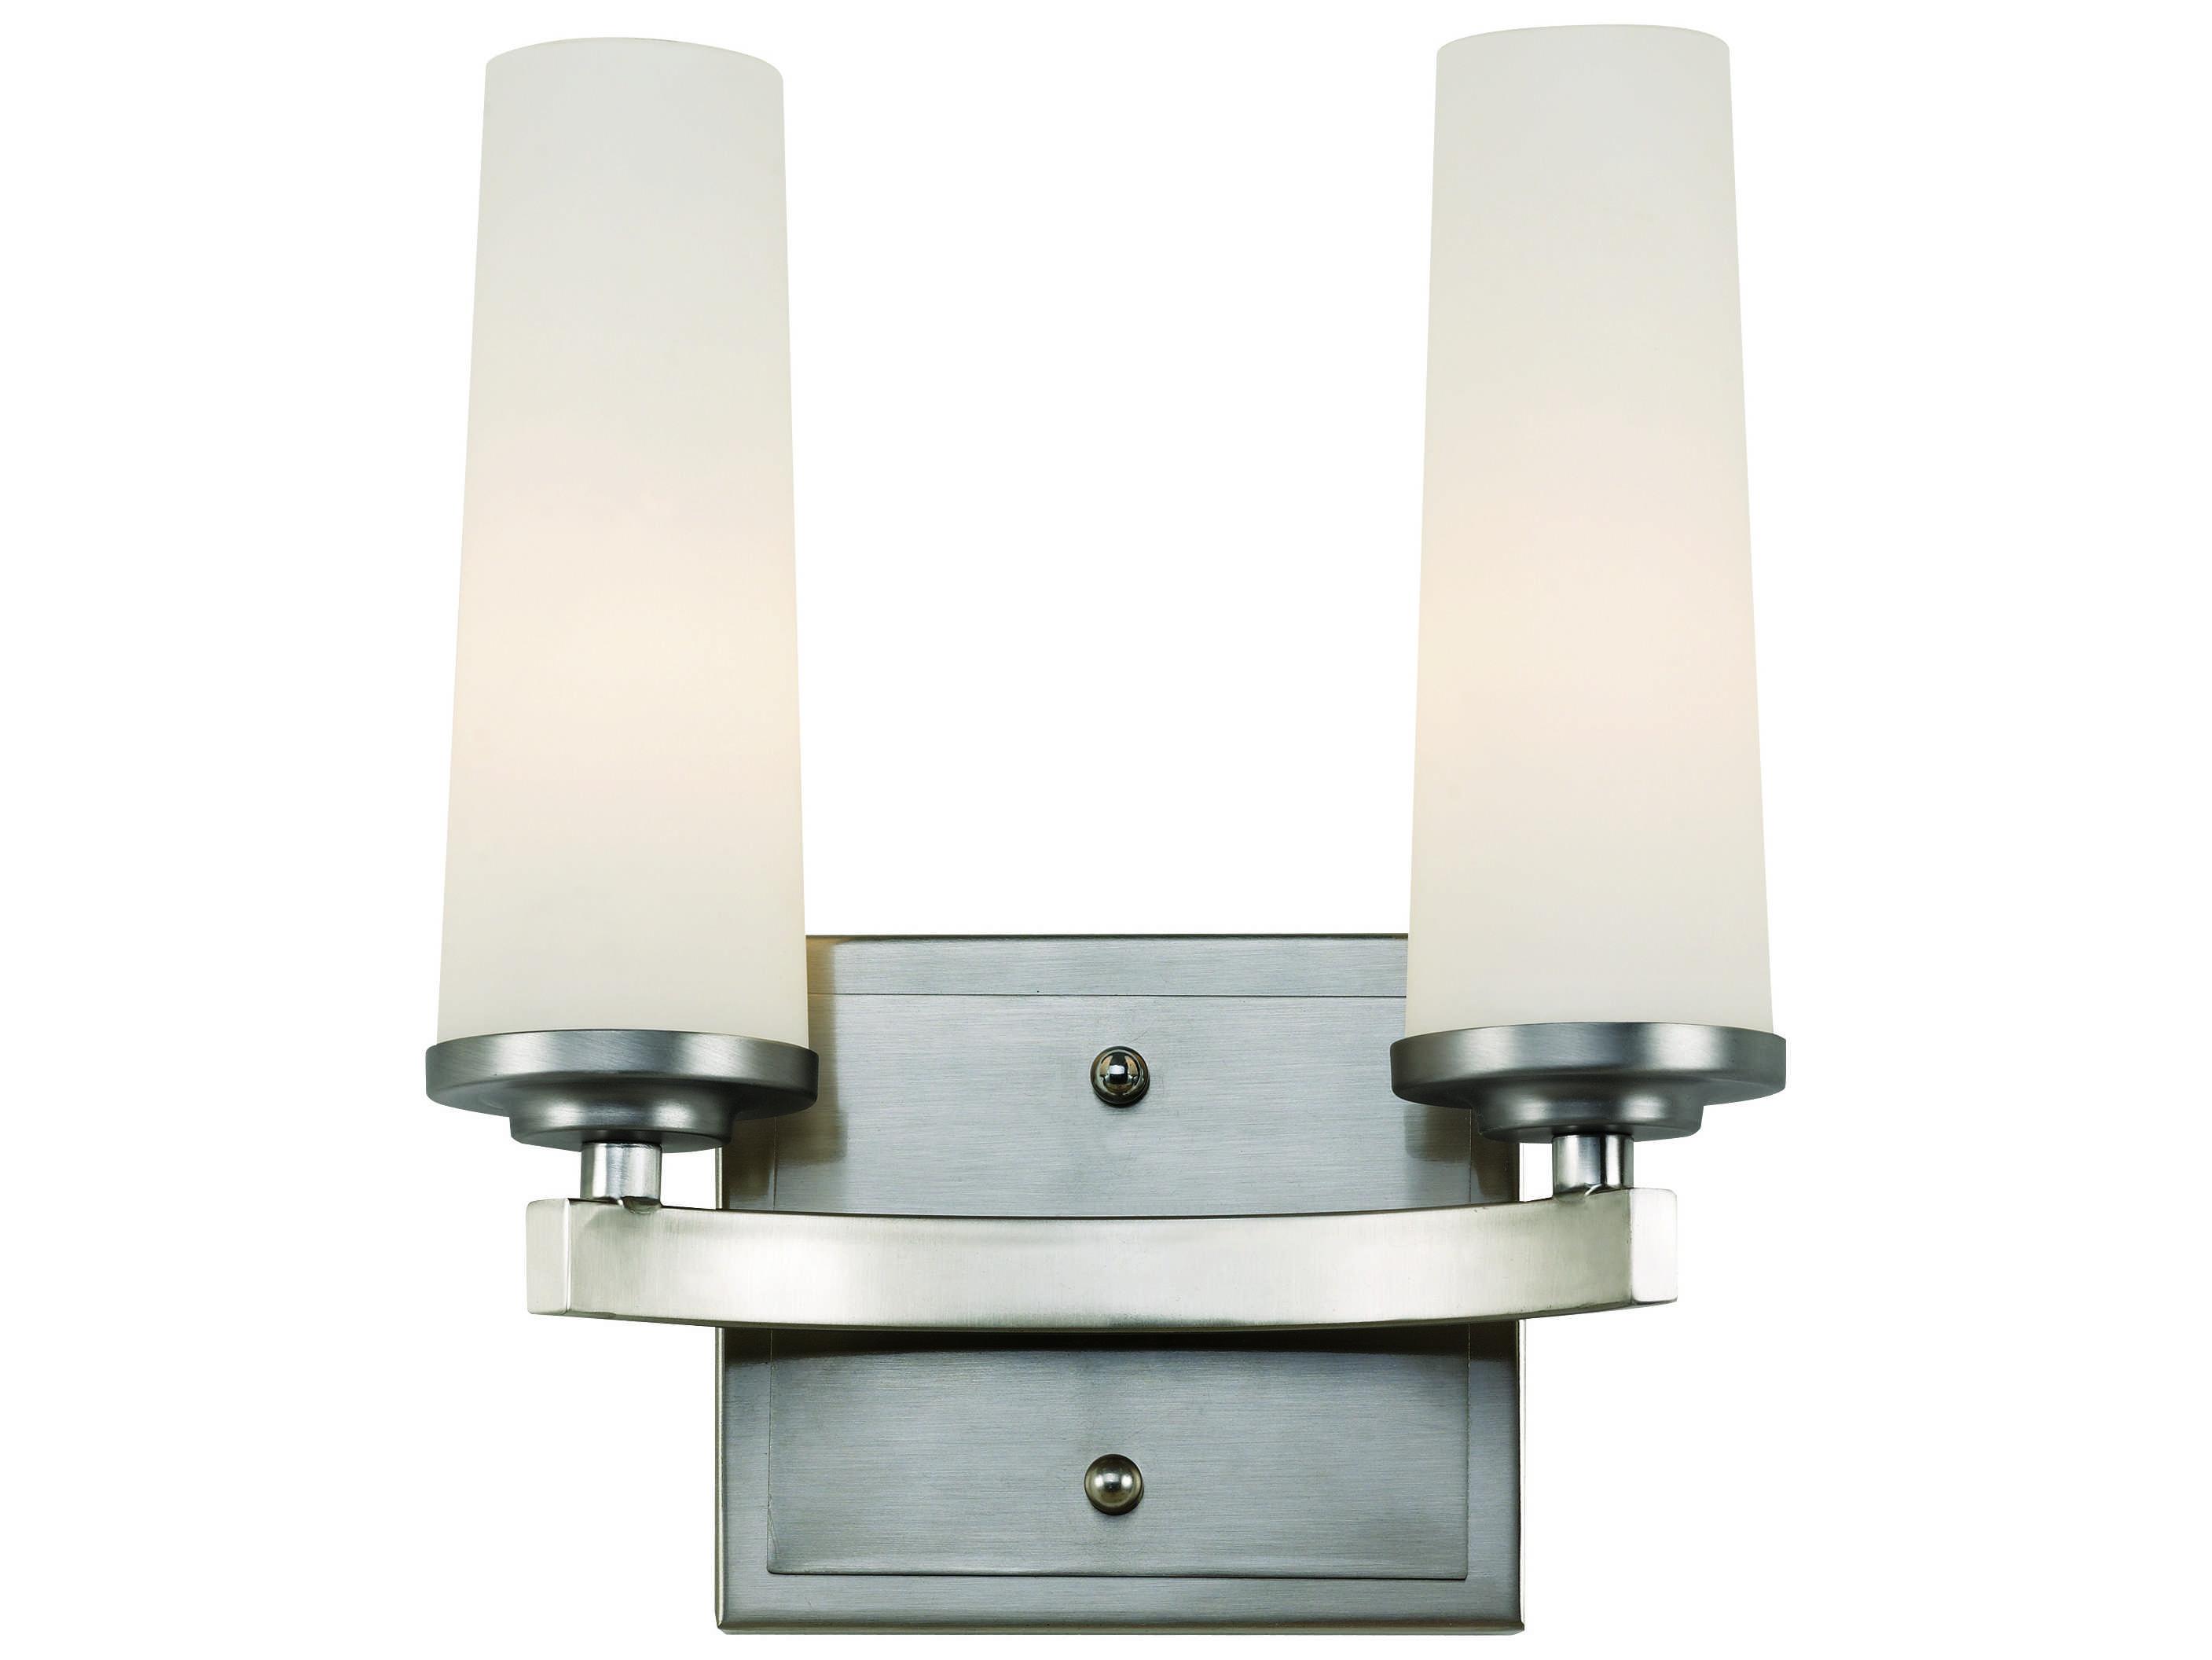 Trans Globe Lighting Urban Inspiration Satin Nickel Two-Light Vanity Light 20242-SN